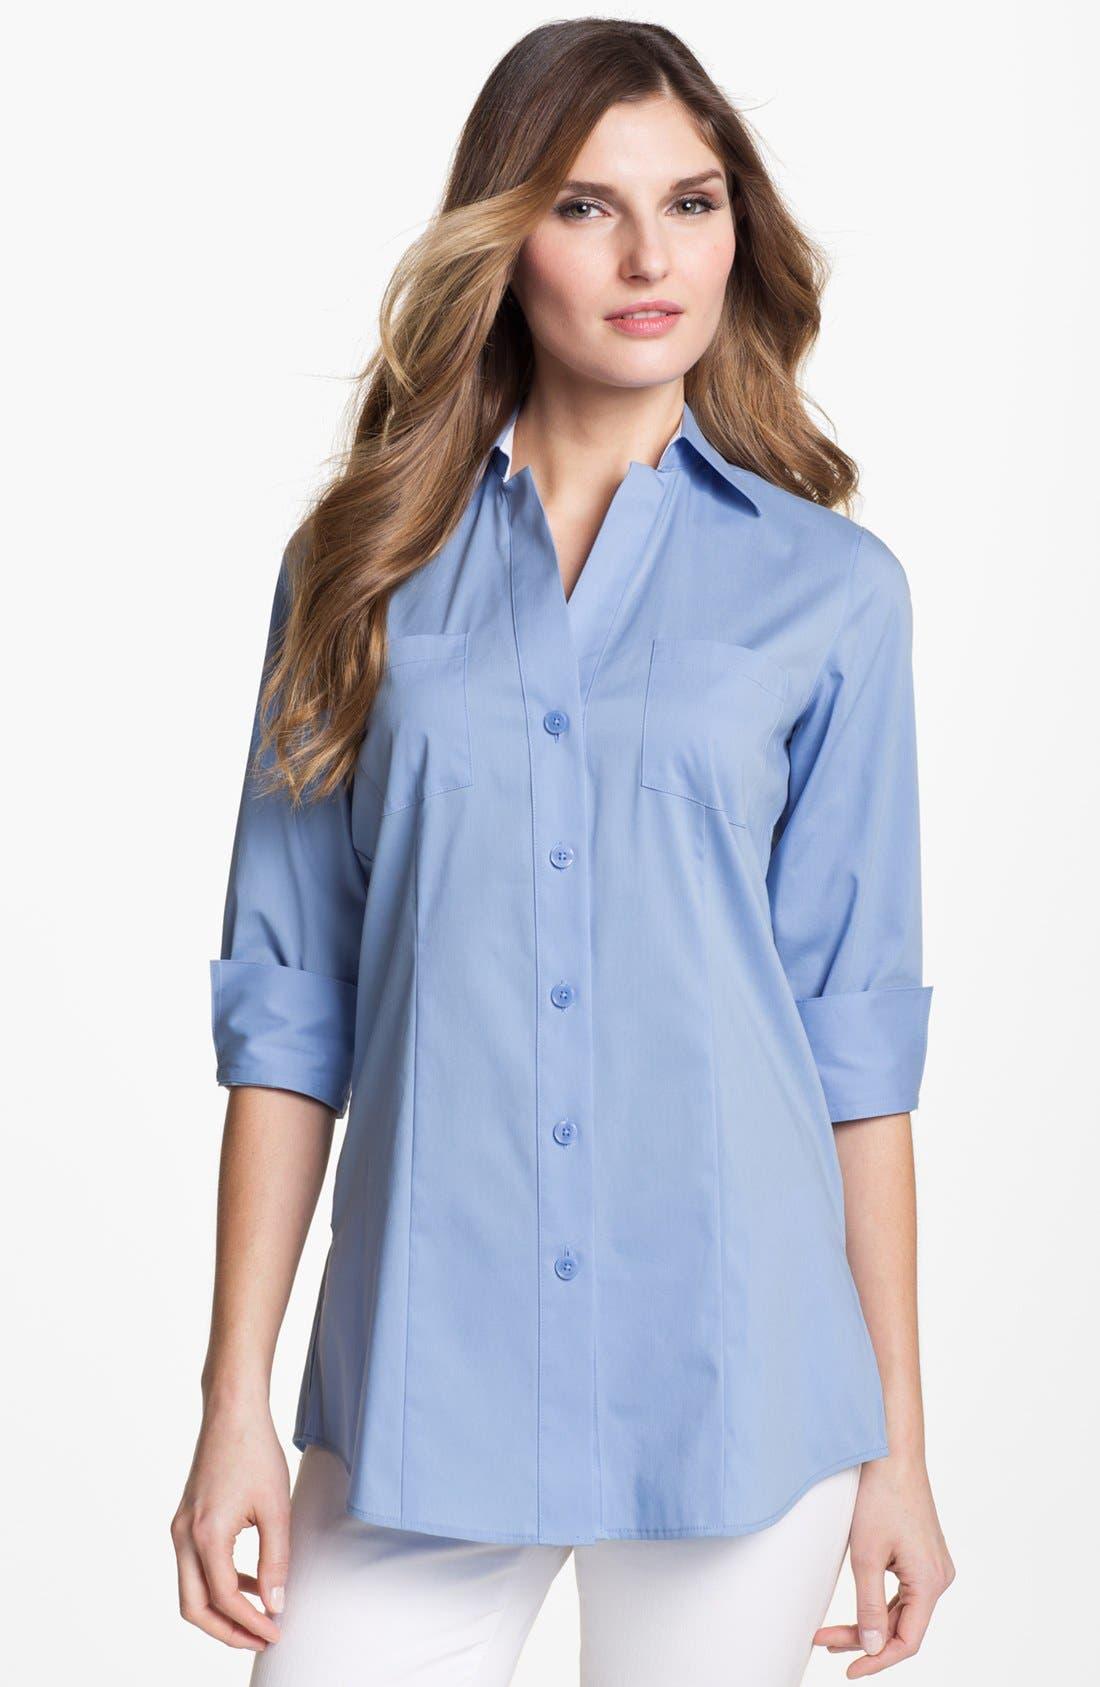 Alternate Image 1 Selected - Foxcroft Three Quarter Sleeve Shaped Shirt